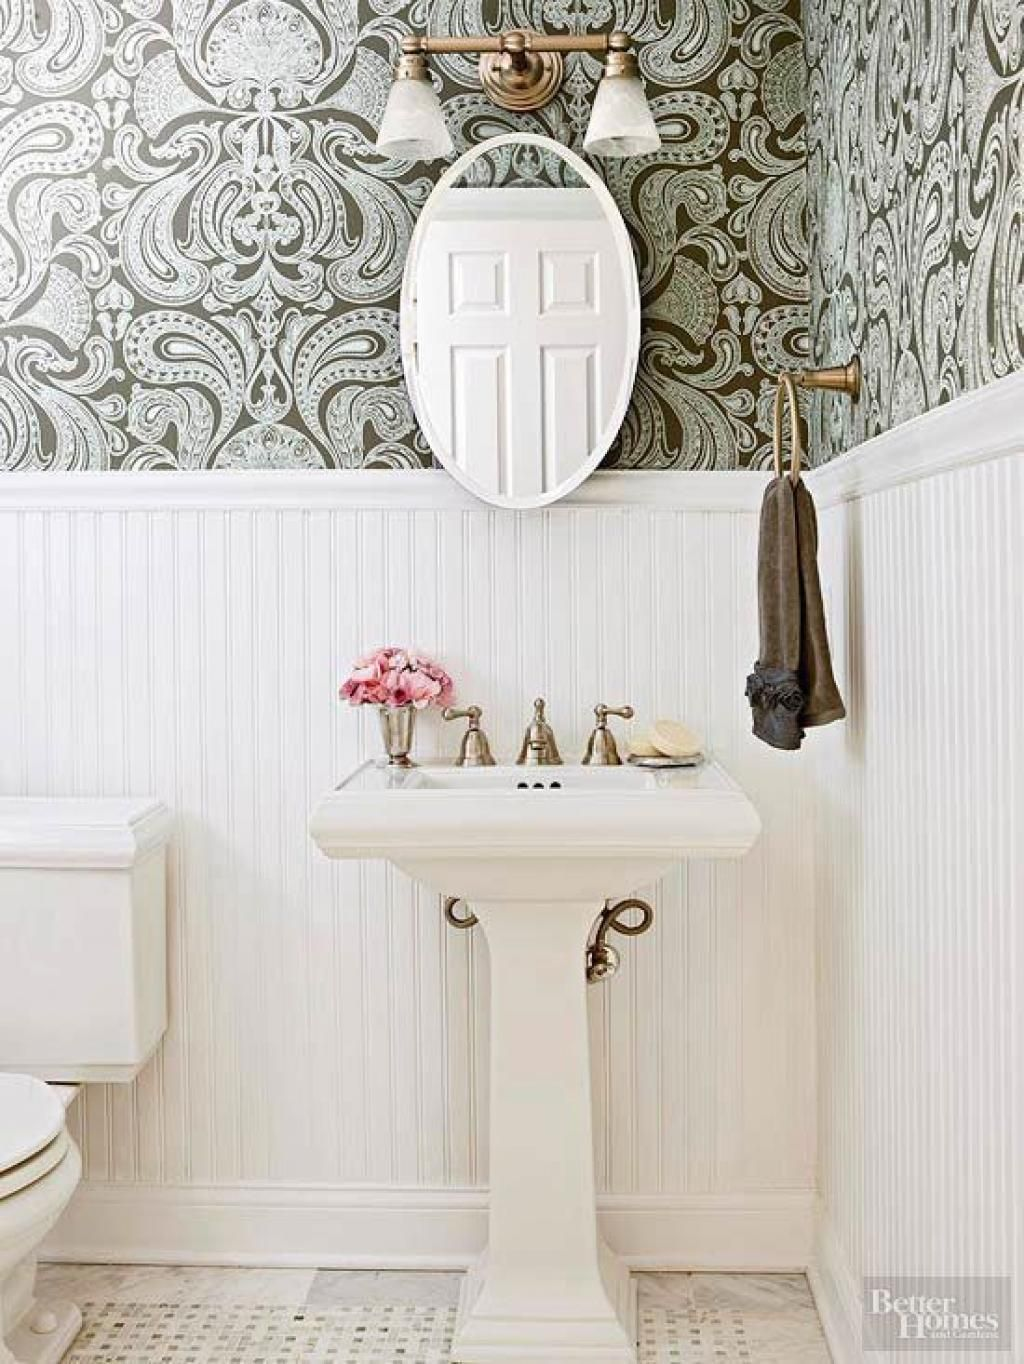 Photo Album Gallery Floral Royal Bathroom Wallpaper Ideas on Small White Modern Bathroom u Home Inspiring